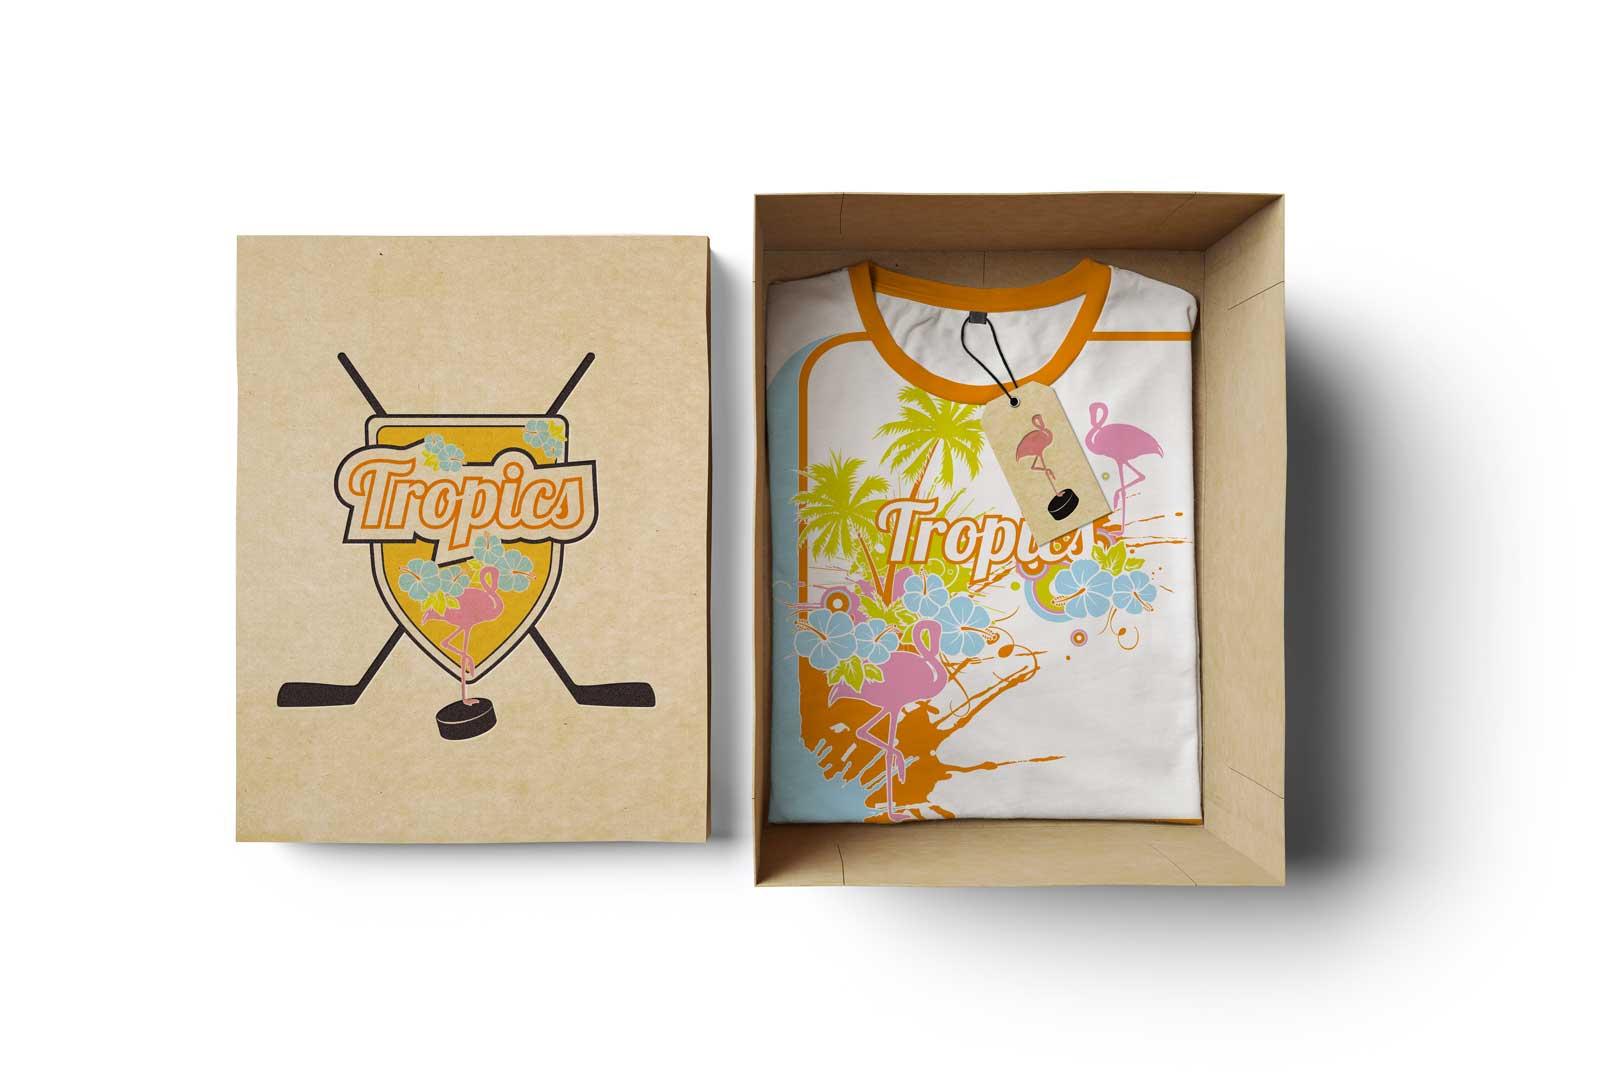 Tropics Trikot T-Shirt Visual Branding Gesa Siebert Kommunikationsdesign